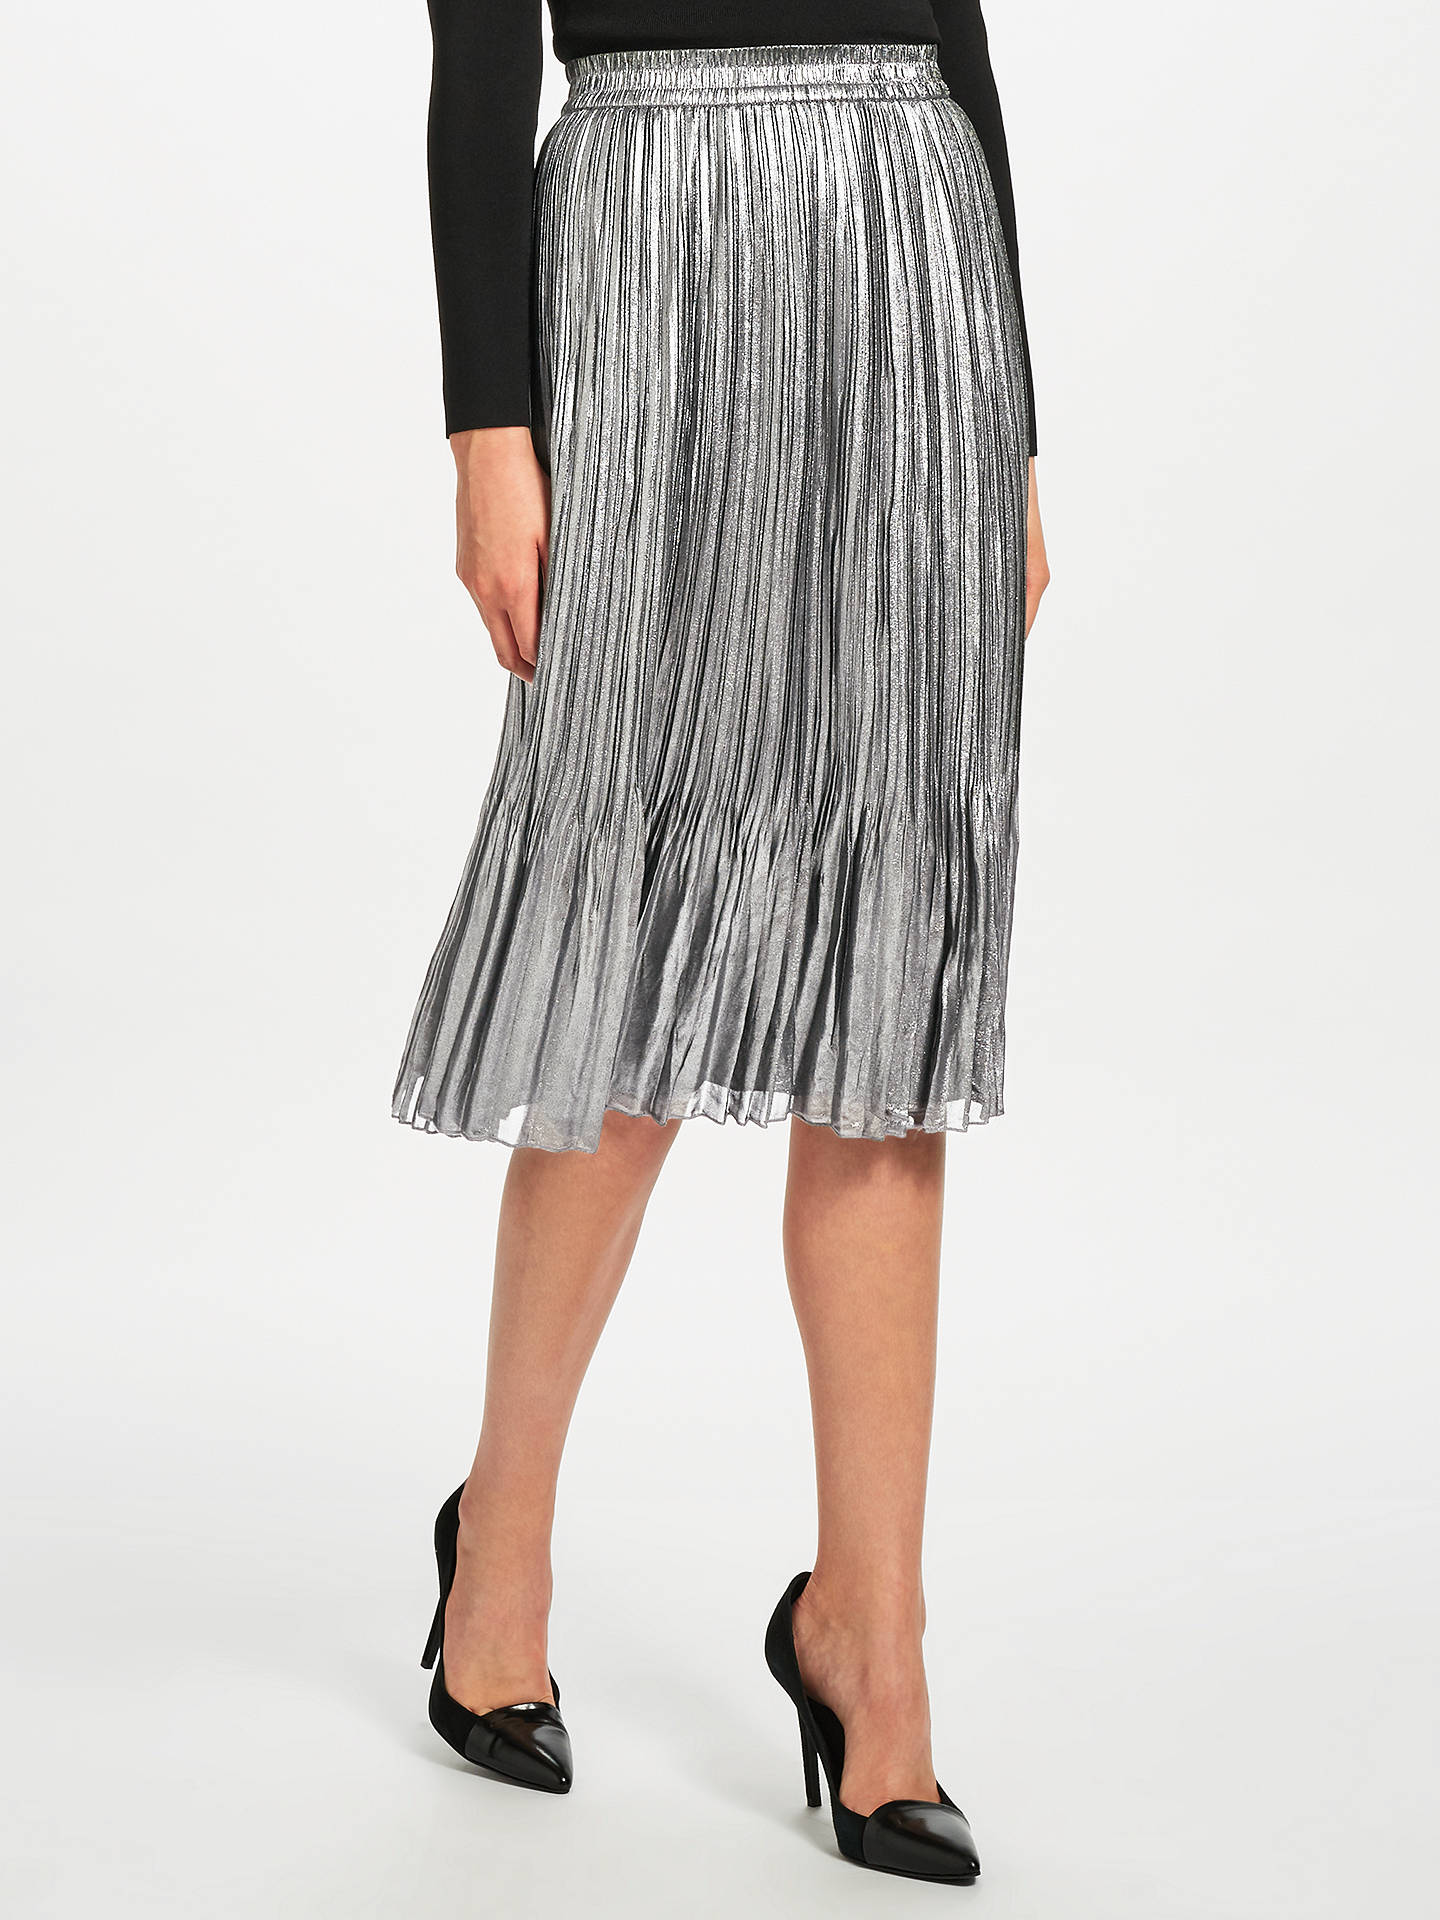 611935eec3ff Buy Maison Scotch Metallic Pleated Midi Skirt, Silver, XS Online at  johnlewis.com ...